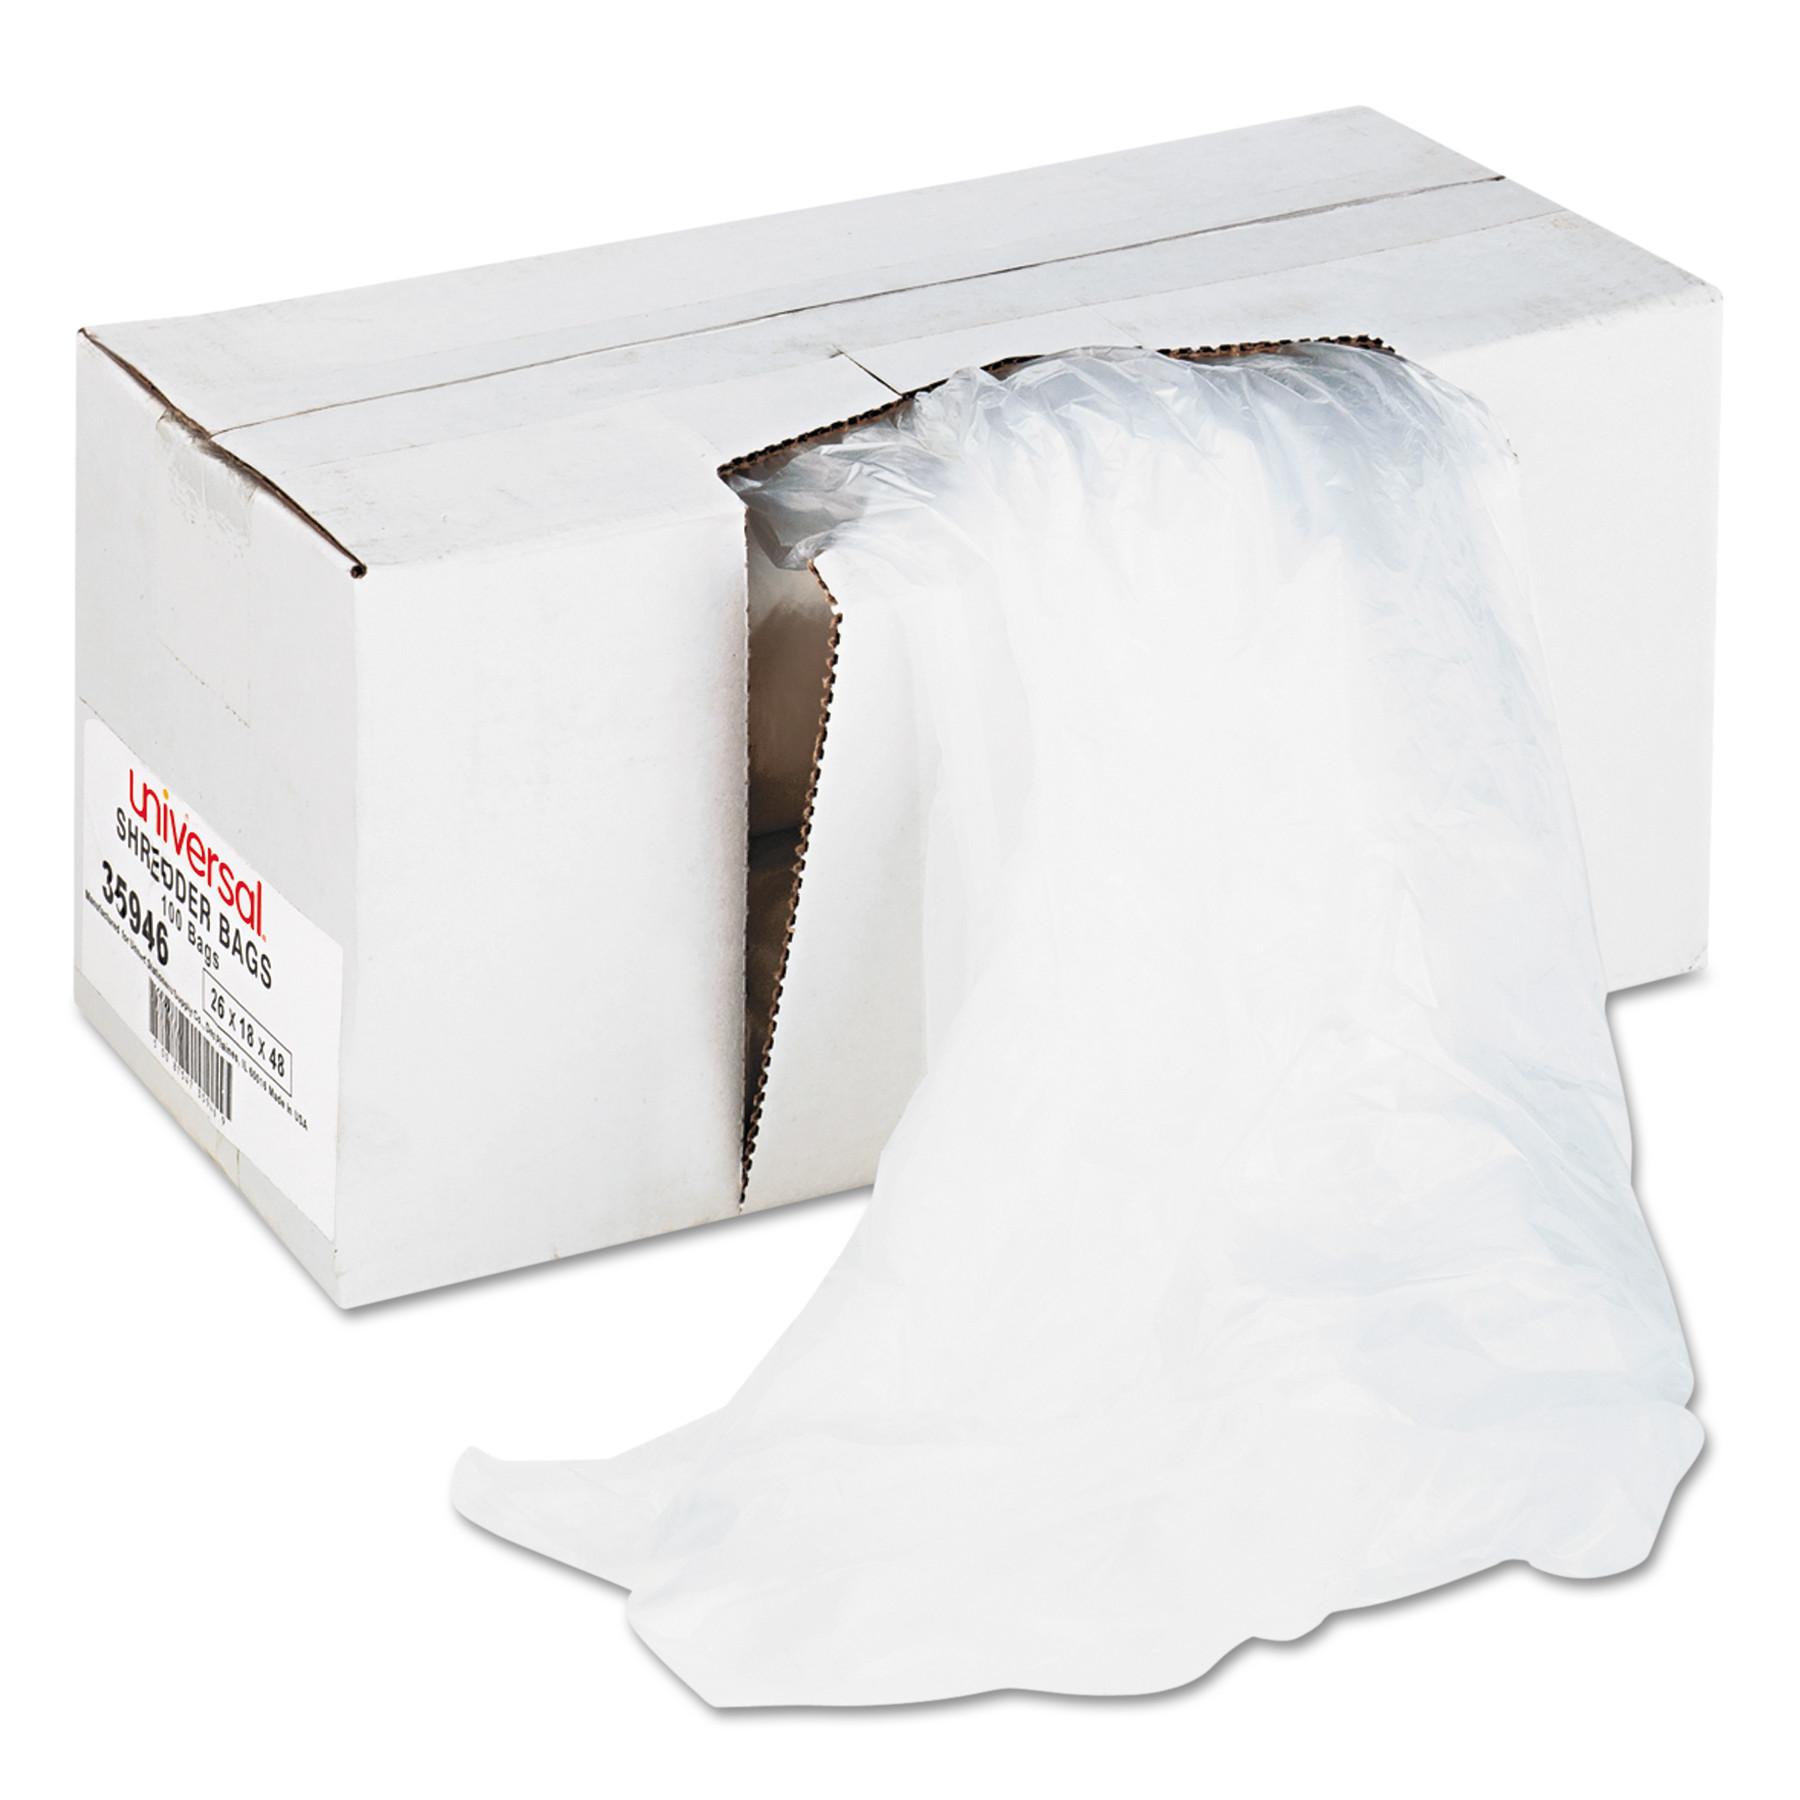 High-Density Shredder Bags, 40-45 gal Capacity, 100/Box